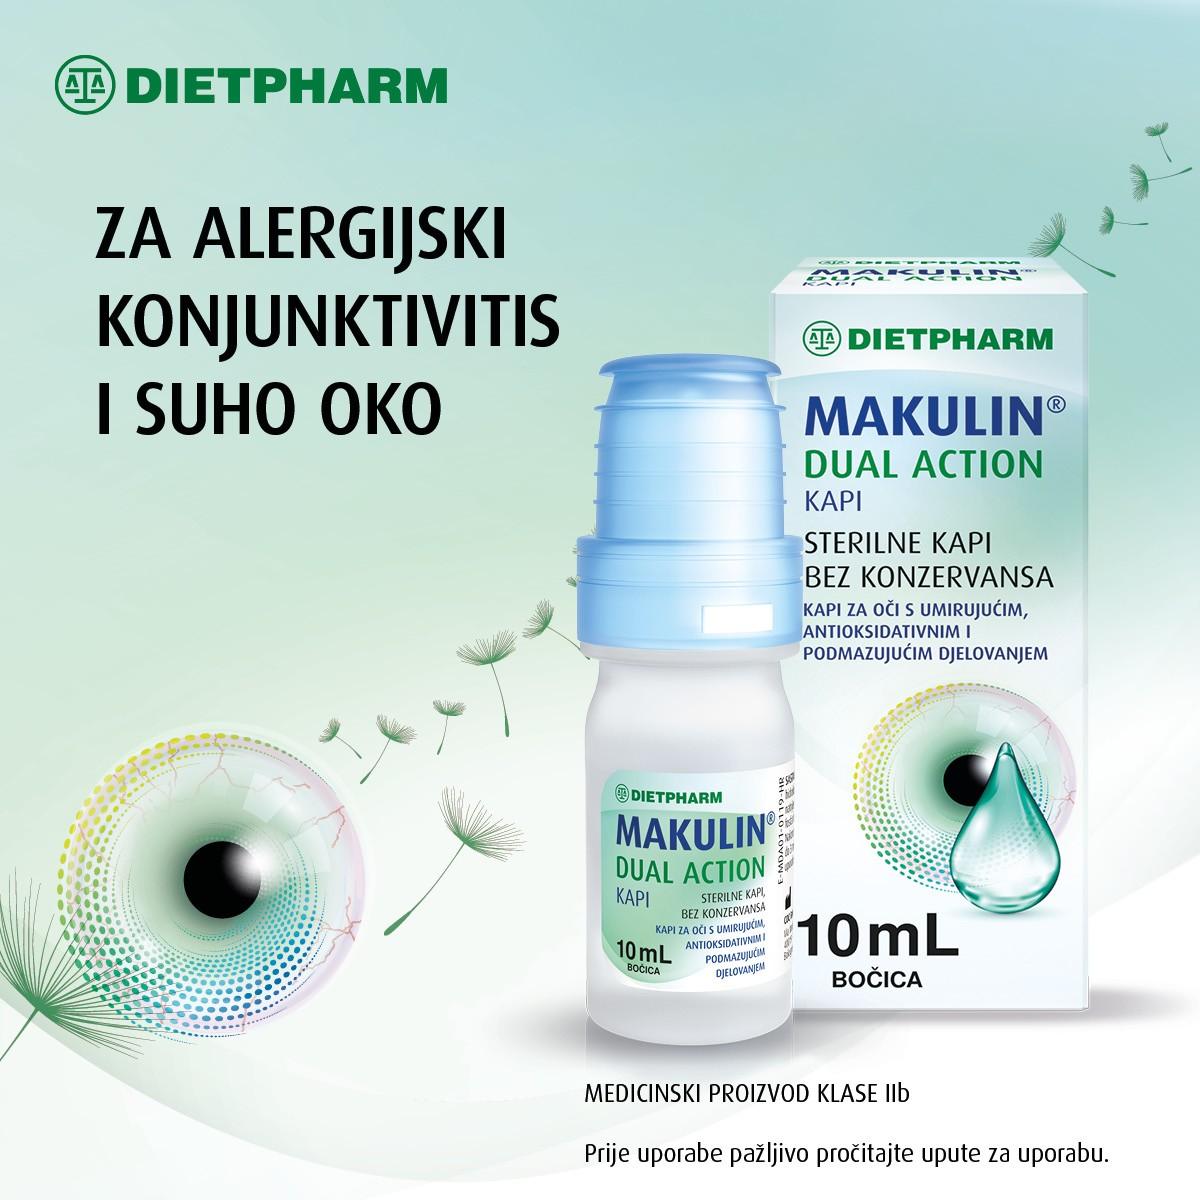 DTPH-Makulin-Dual-Action-FB-vizual-5-11-19-HR